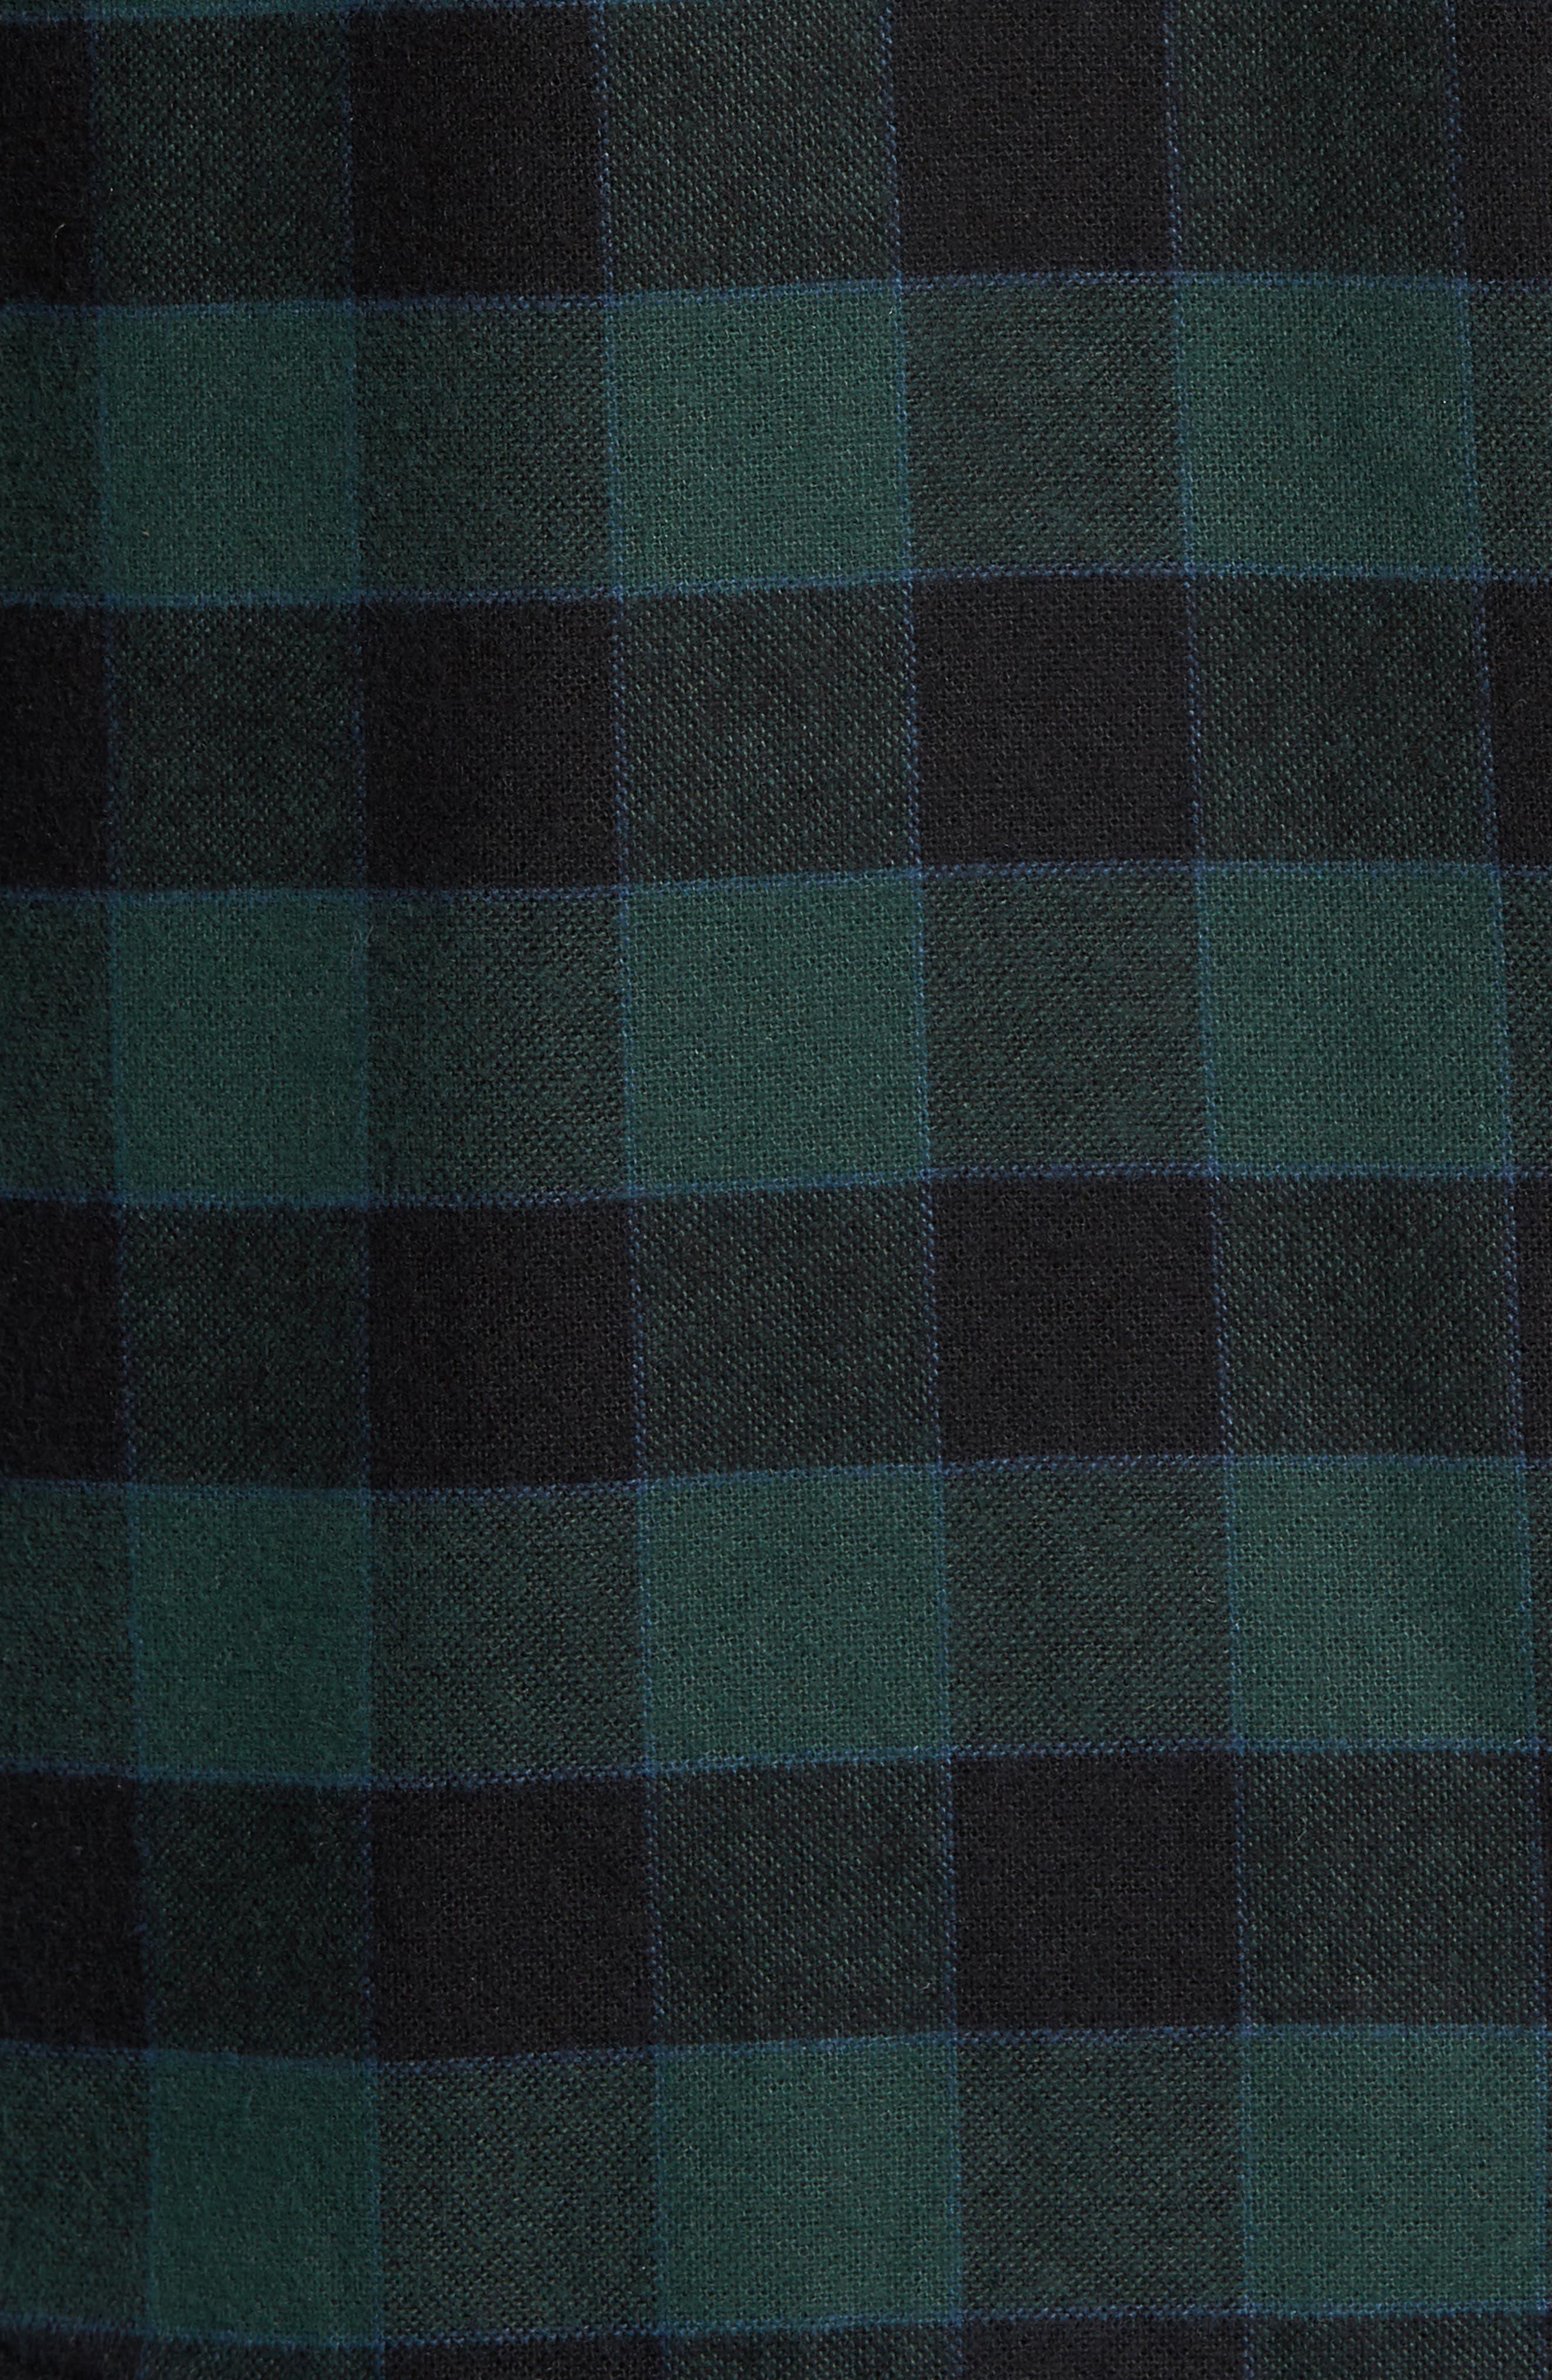 Check Shirt Jacket with Faux Shearling Lining,                             Alternate thumbnail 6, color,                             301